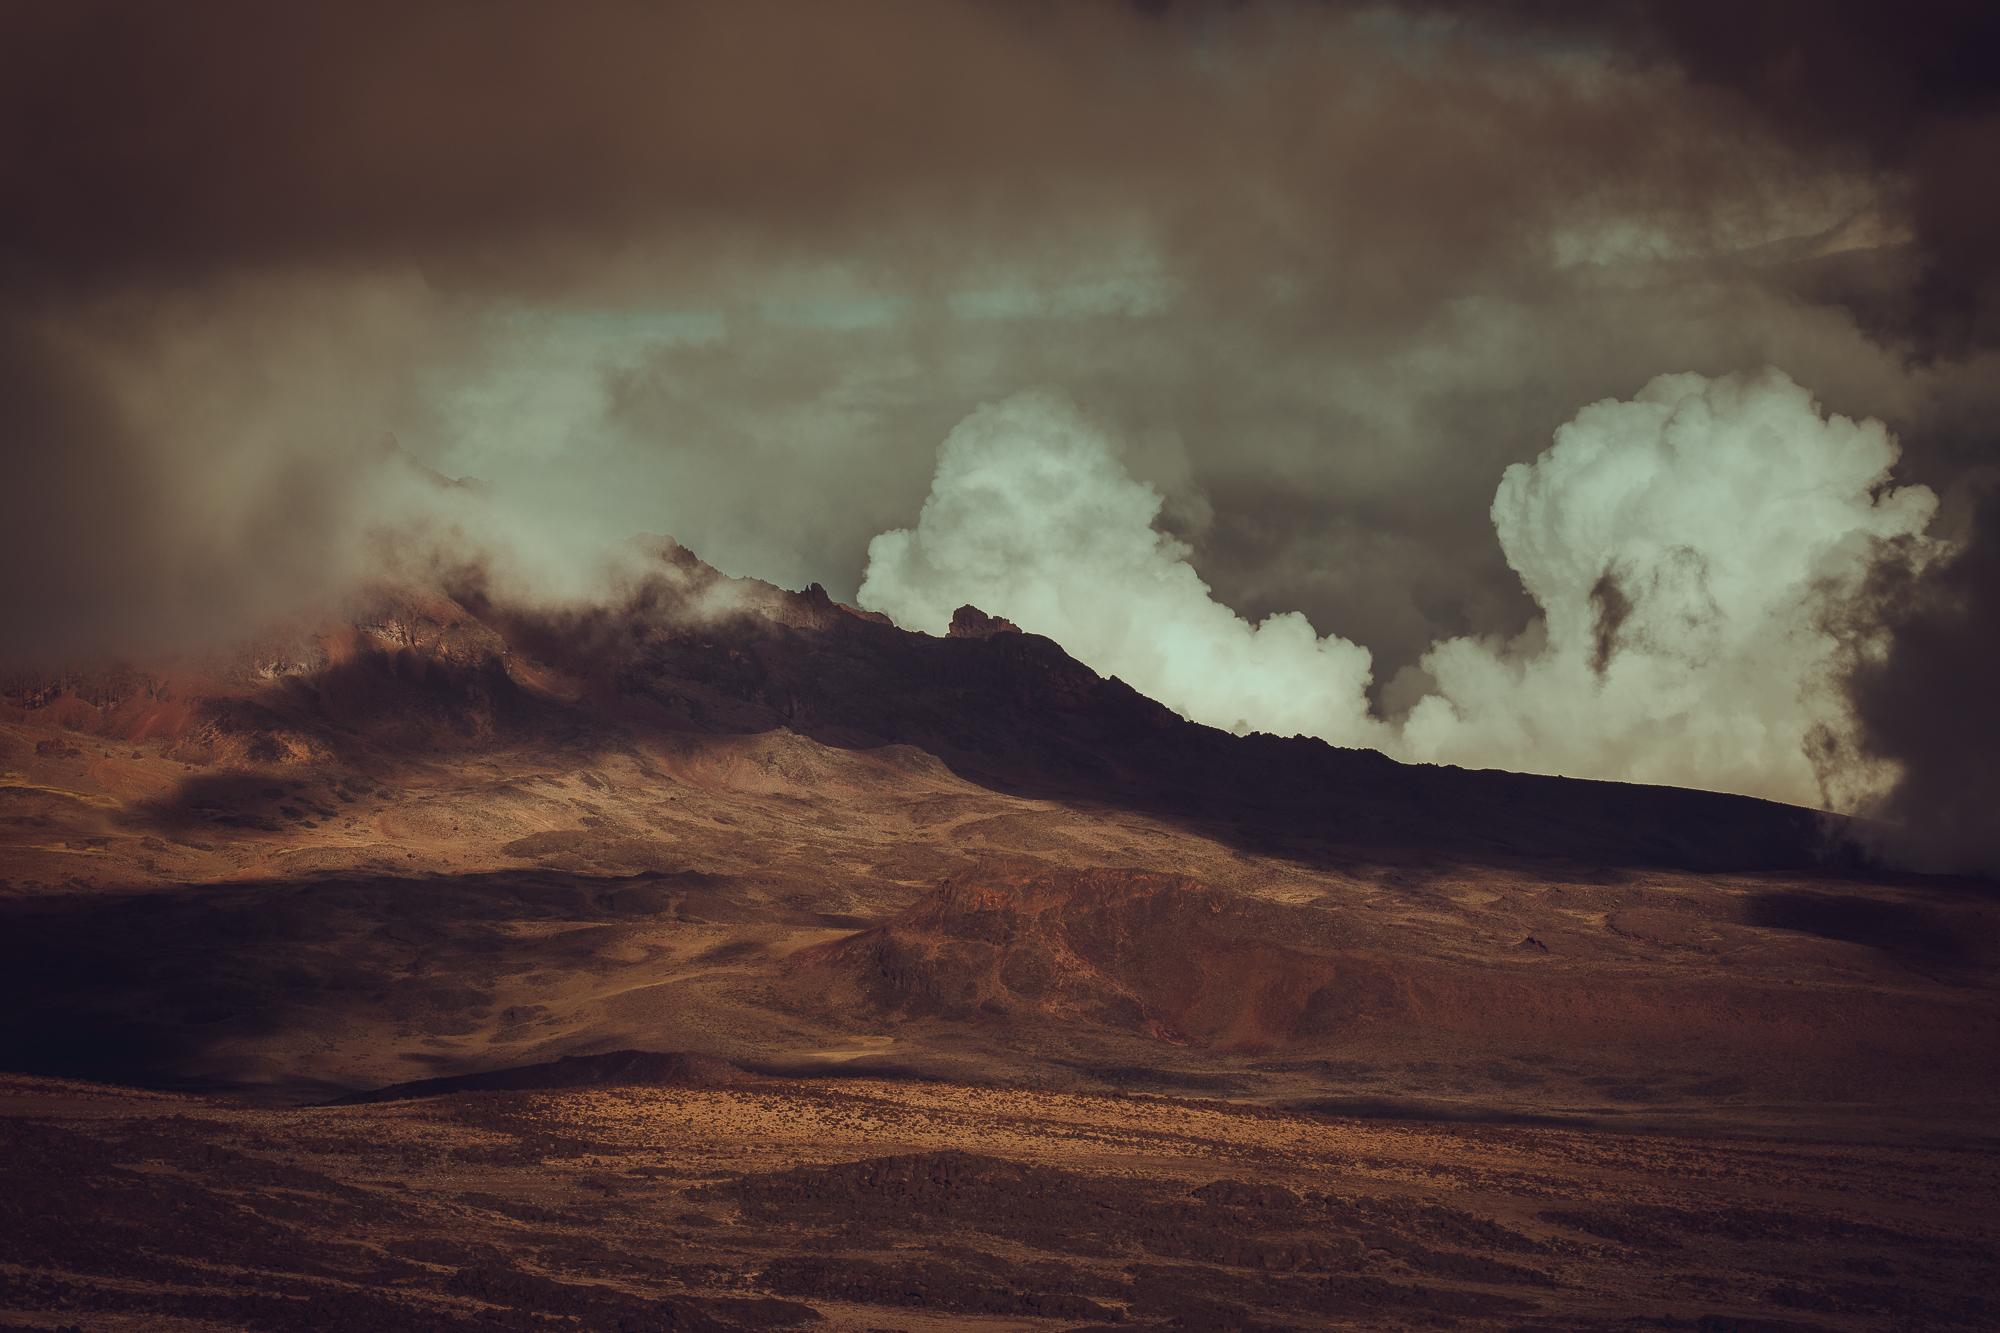 L'ascension du Kilimandjaro avec Yohan Terraza I NIKON LE MAG